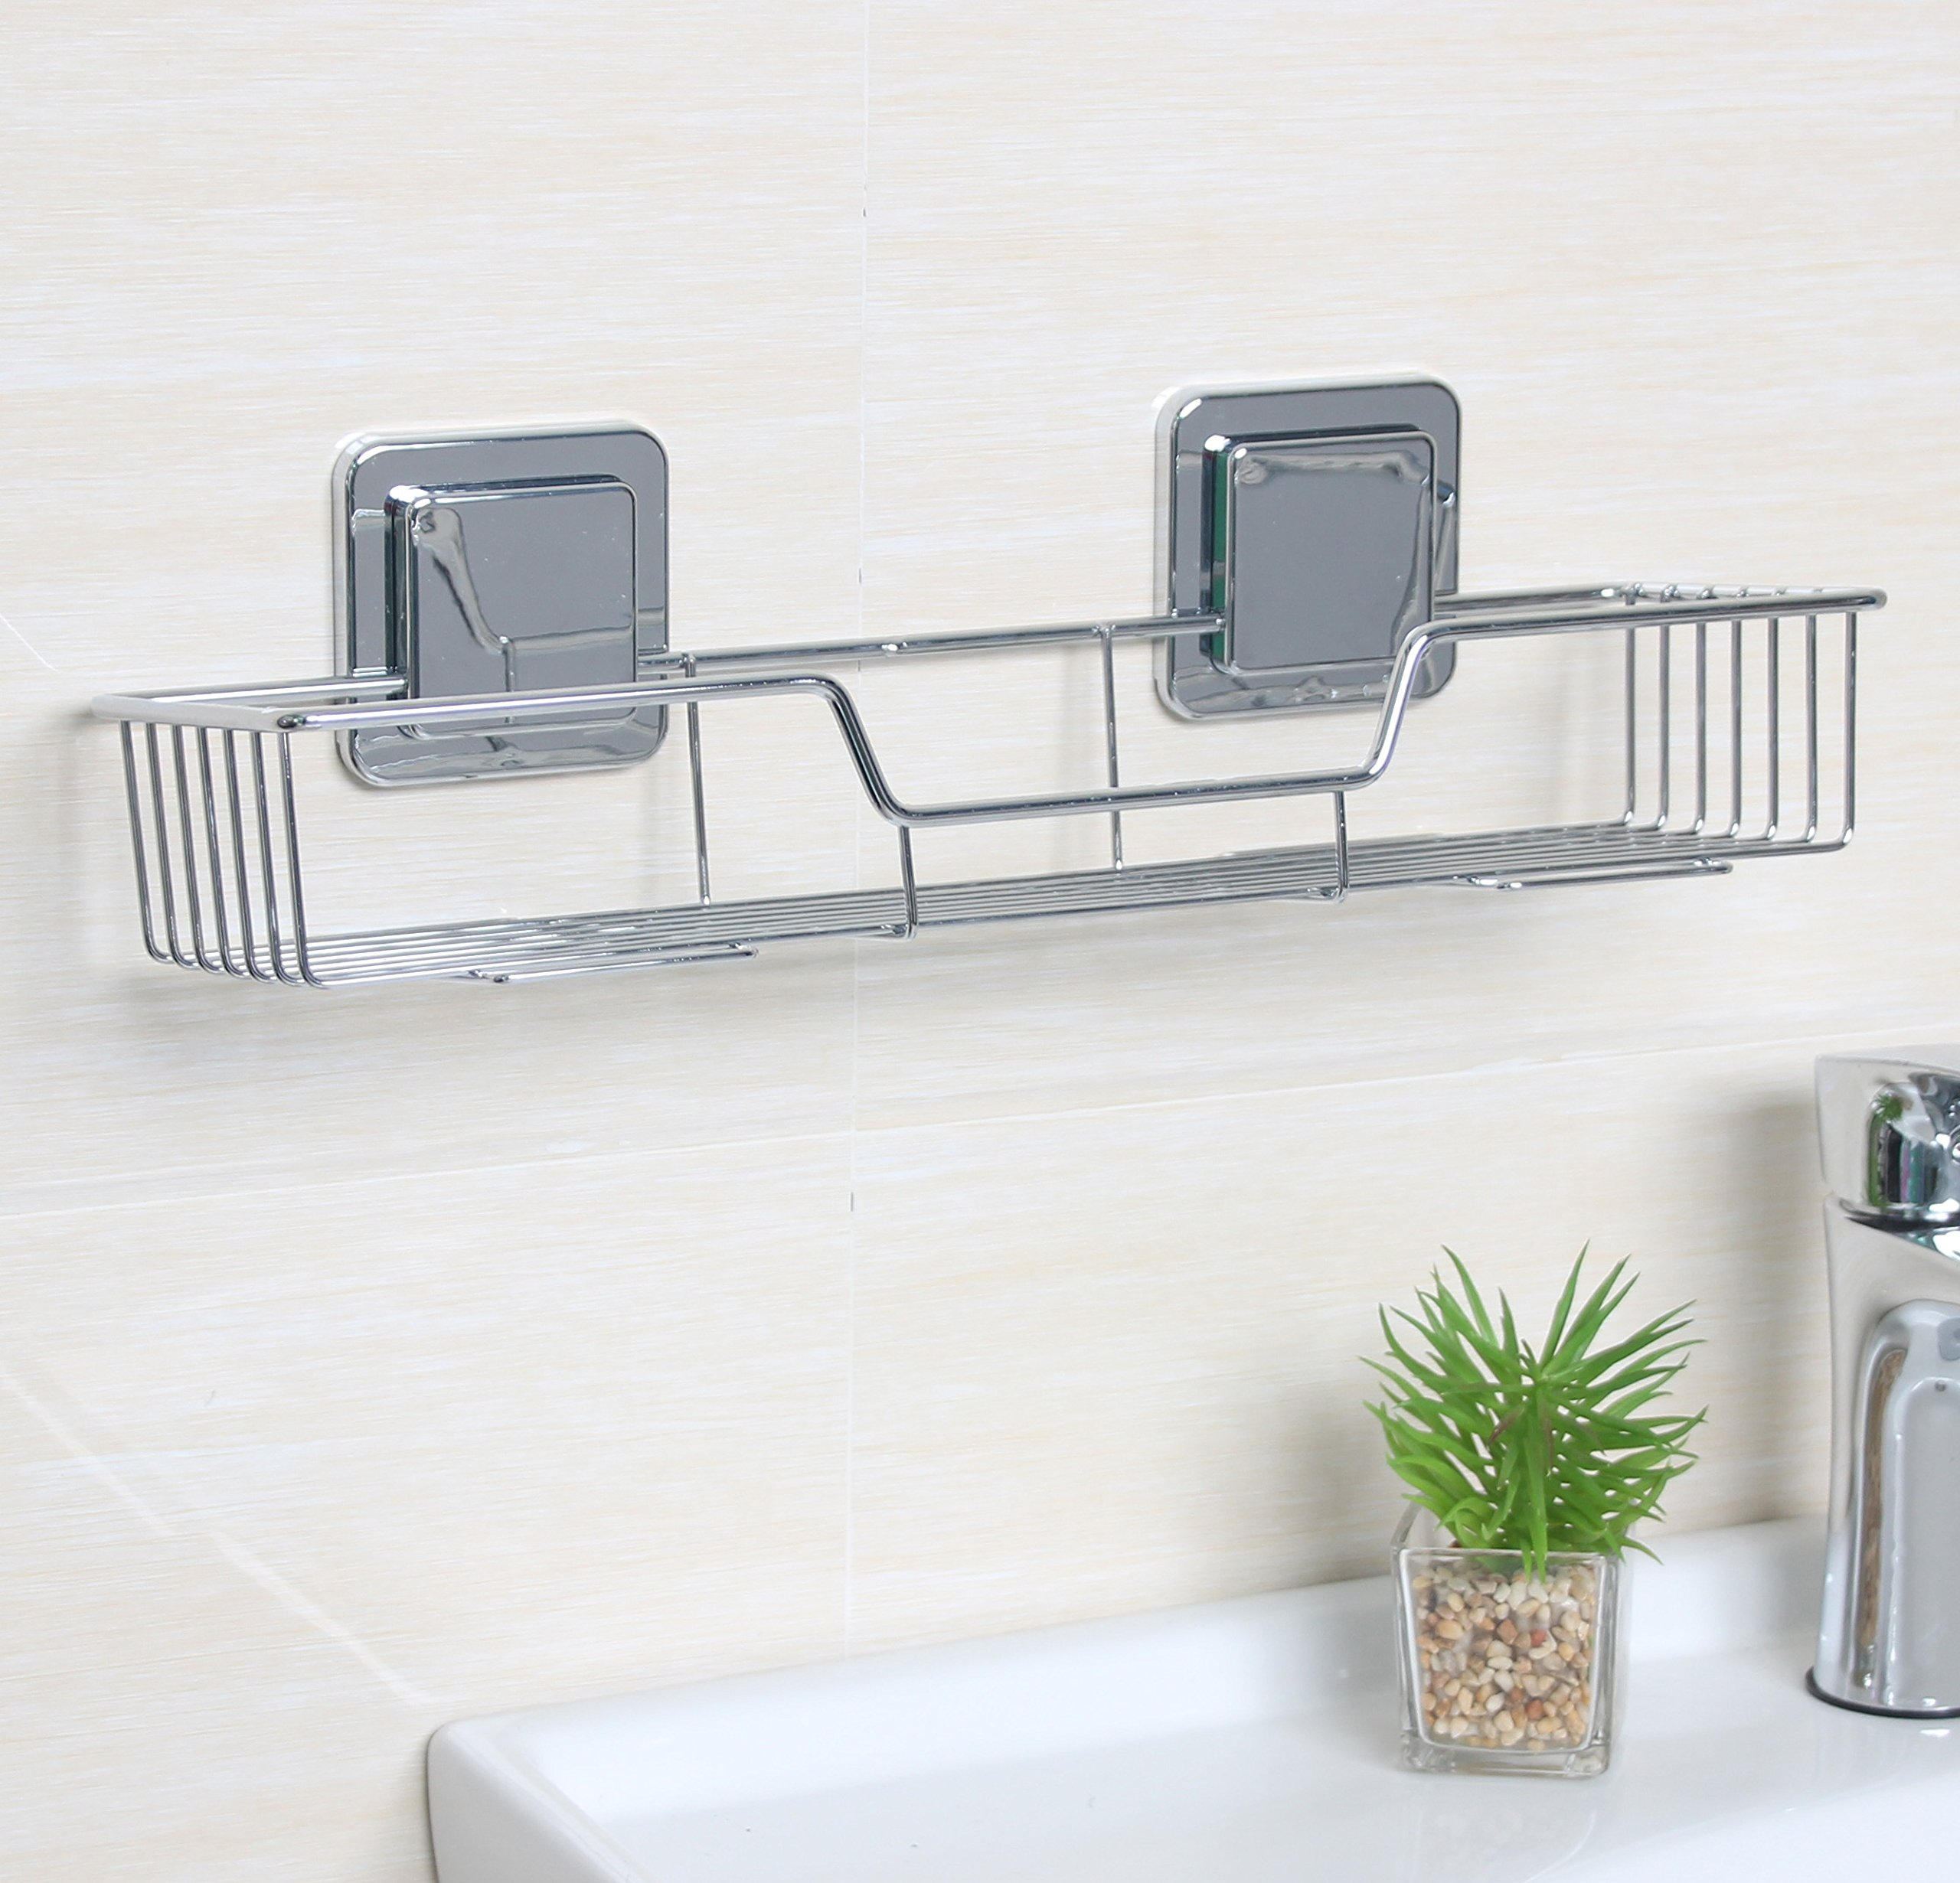 Cheap Shower Caddy Basket, find Shower Caddy Basket deals on line at ...